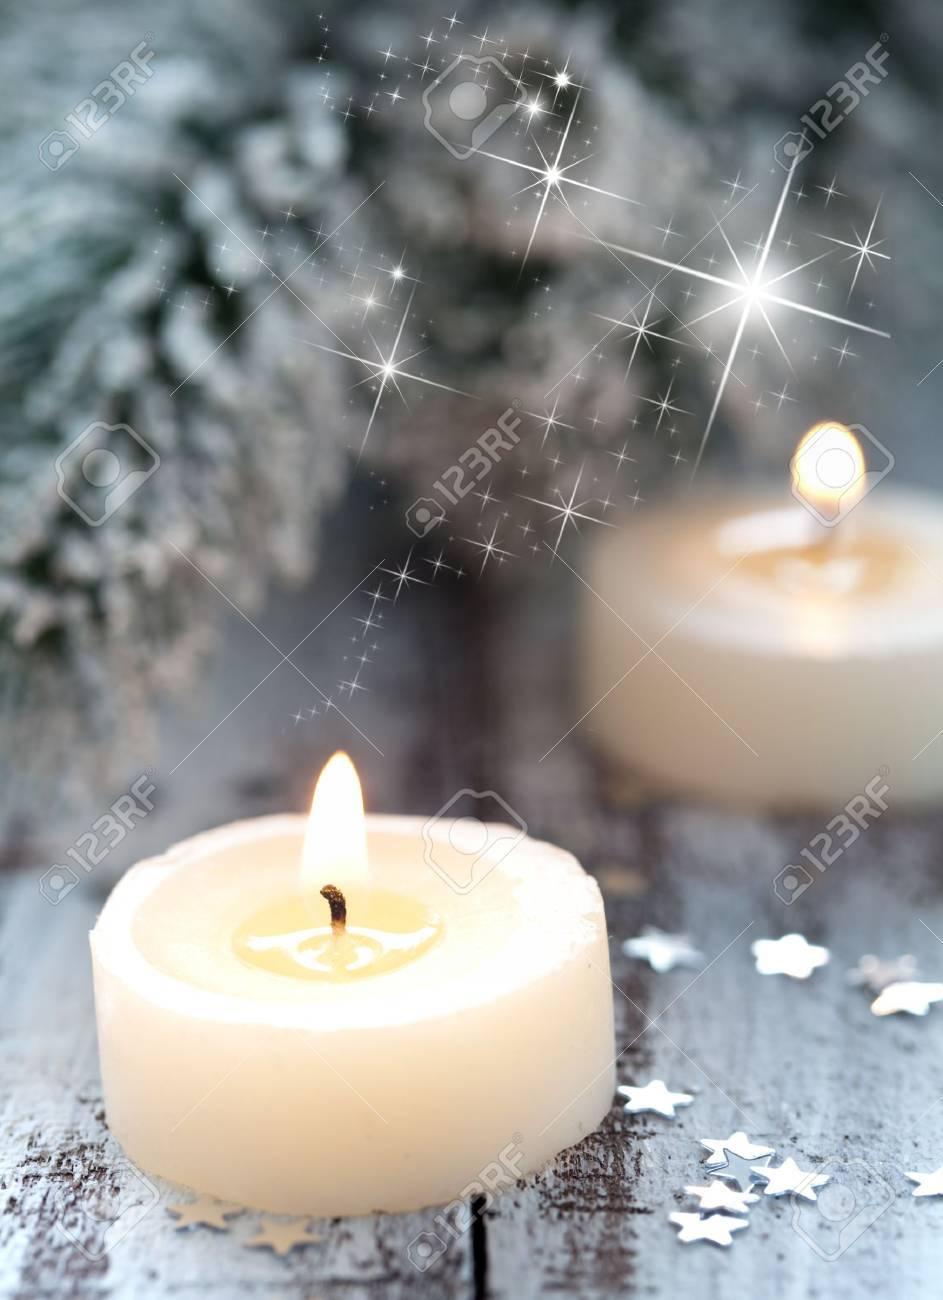 burning candles and decoration Stock Photo - 10121248